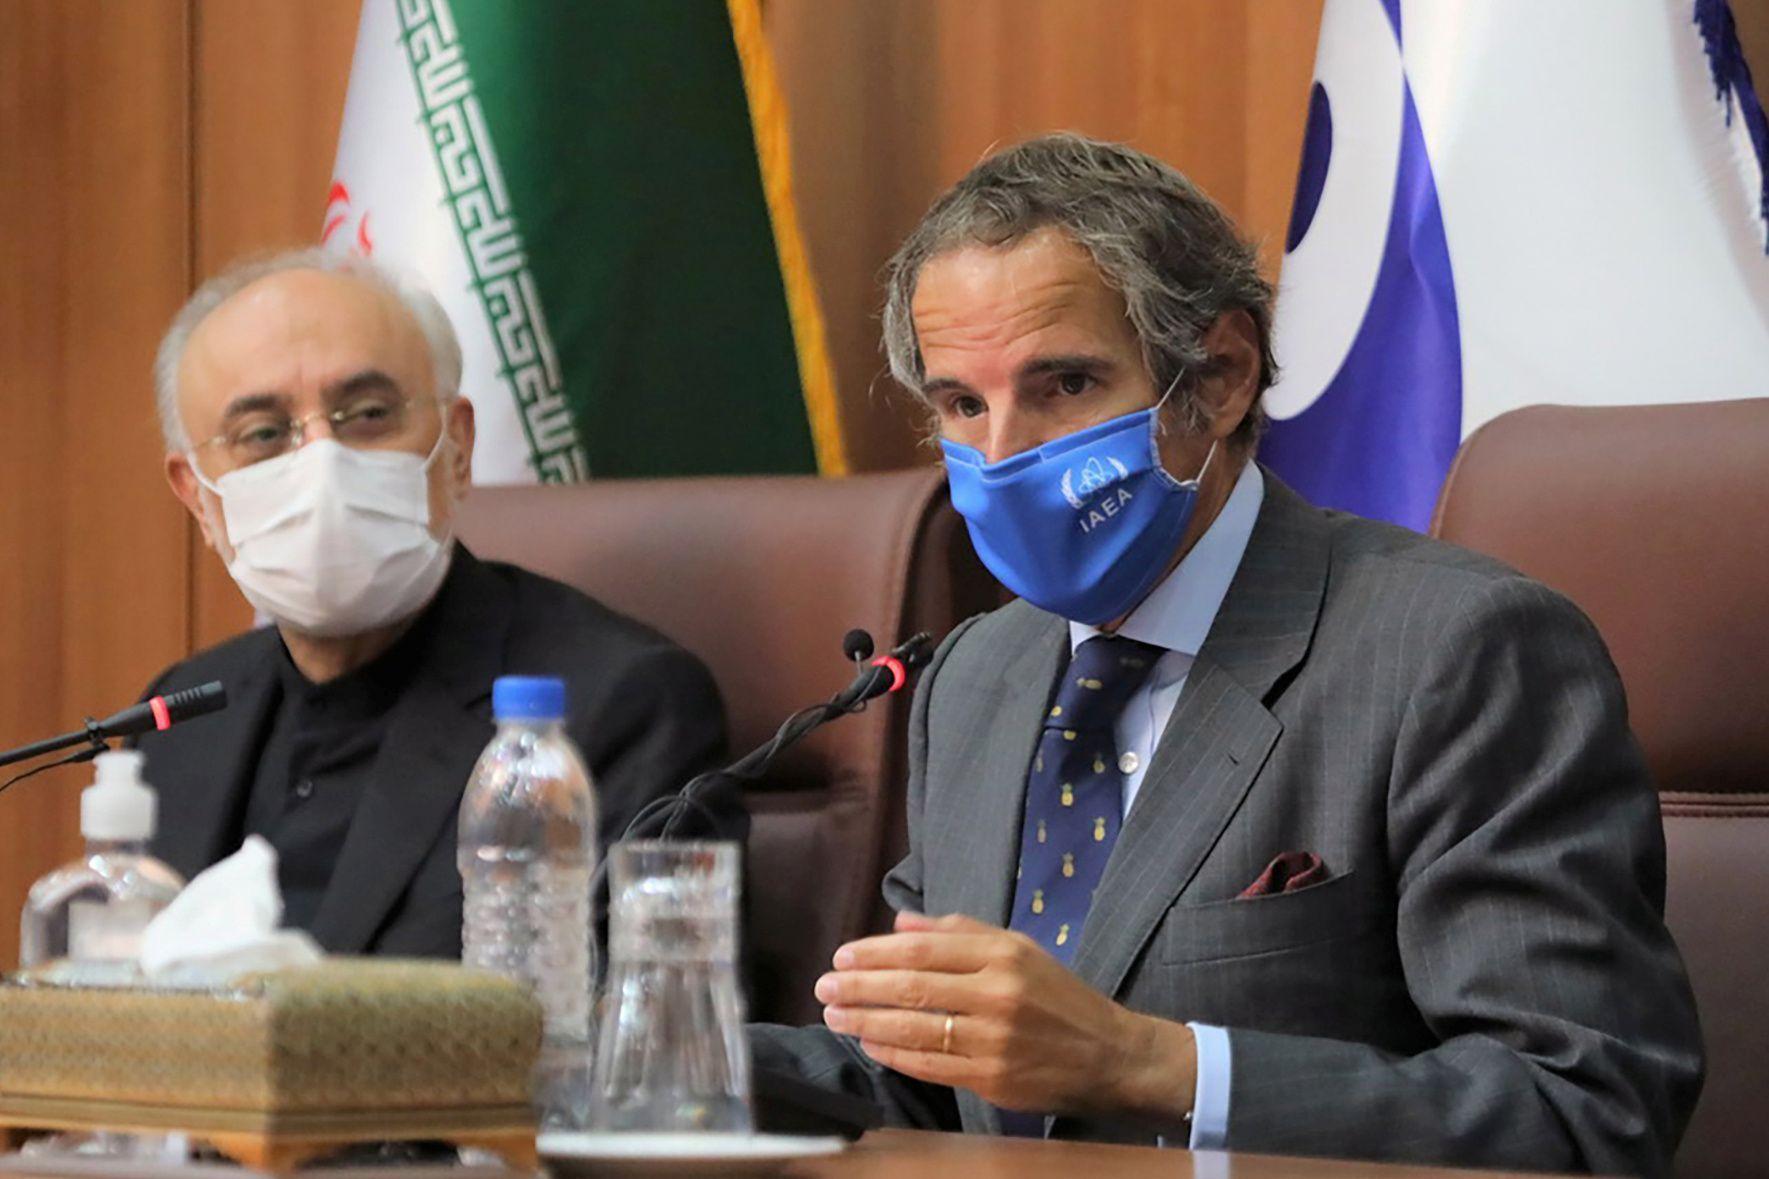 International Atomic Energy Agency (IAEA) Director General Rafael Grossi speaks during a press conference with Head of Iran's Atomic Energy Organization Ali-Akbar Salehi in Tehran, Iran August 25, 2020.